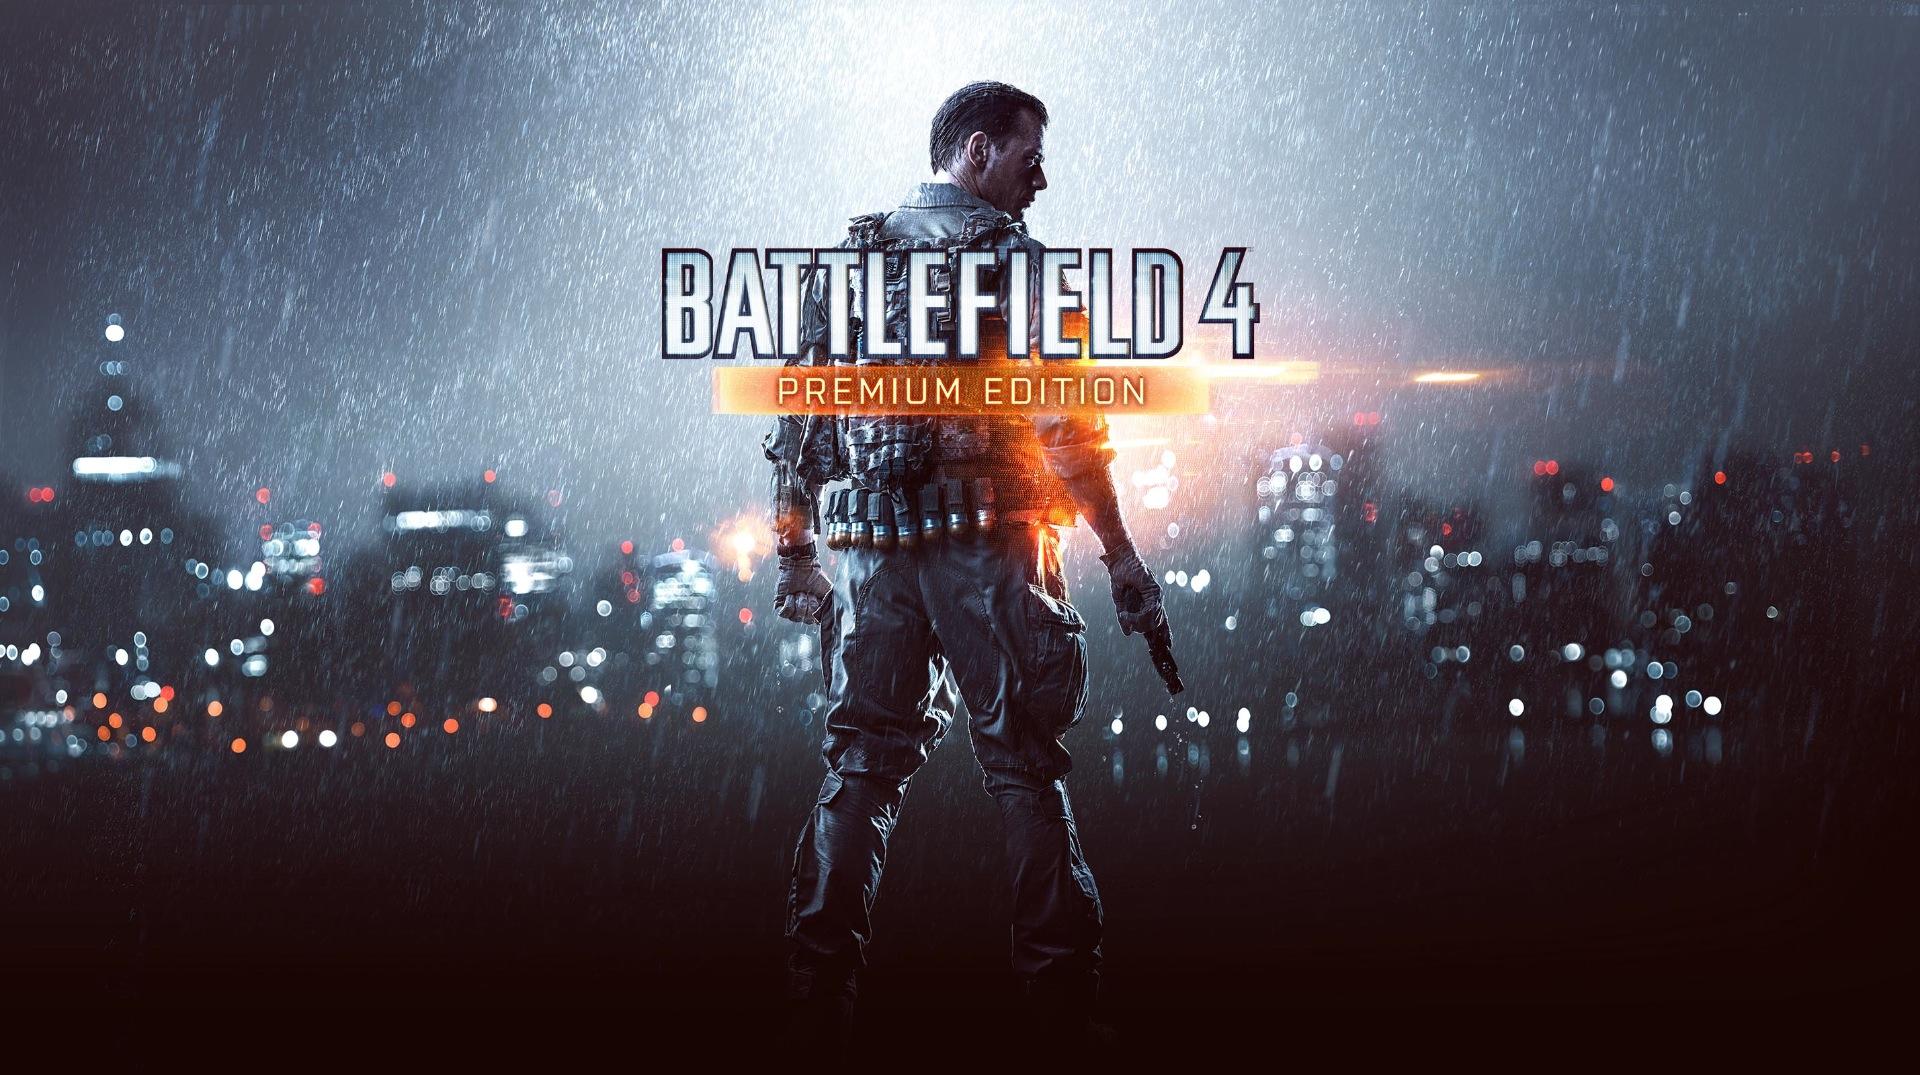 Battlefield 4: Premium Edition 2013 pc game Img-1